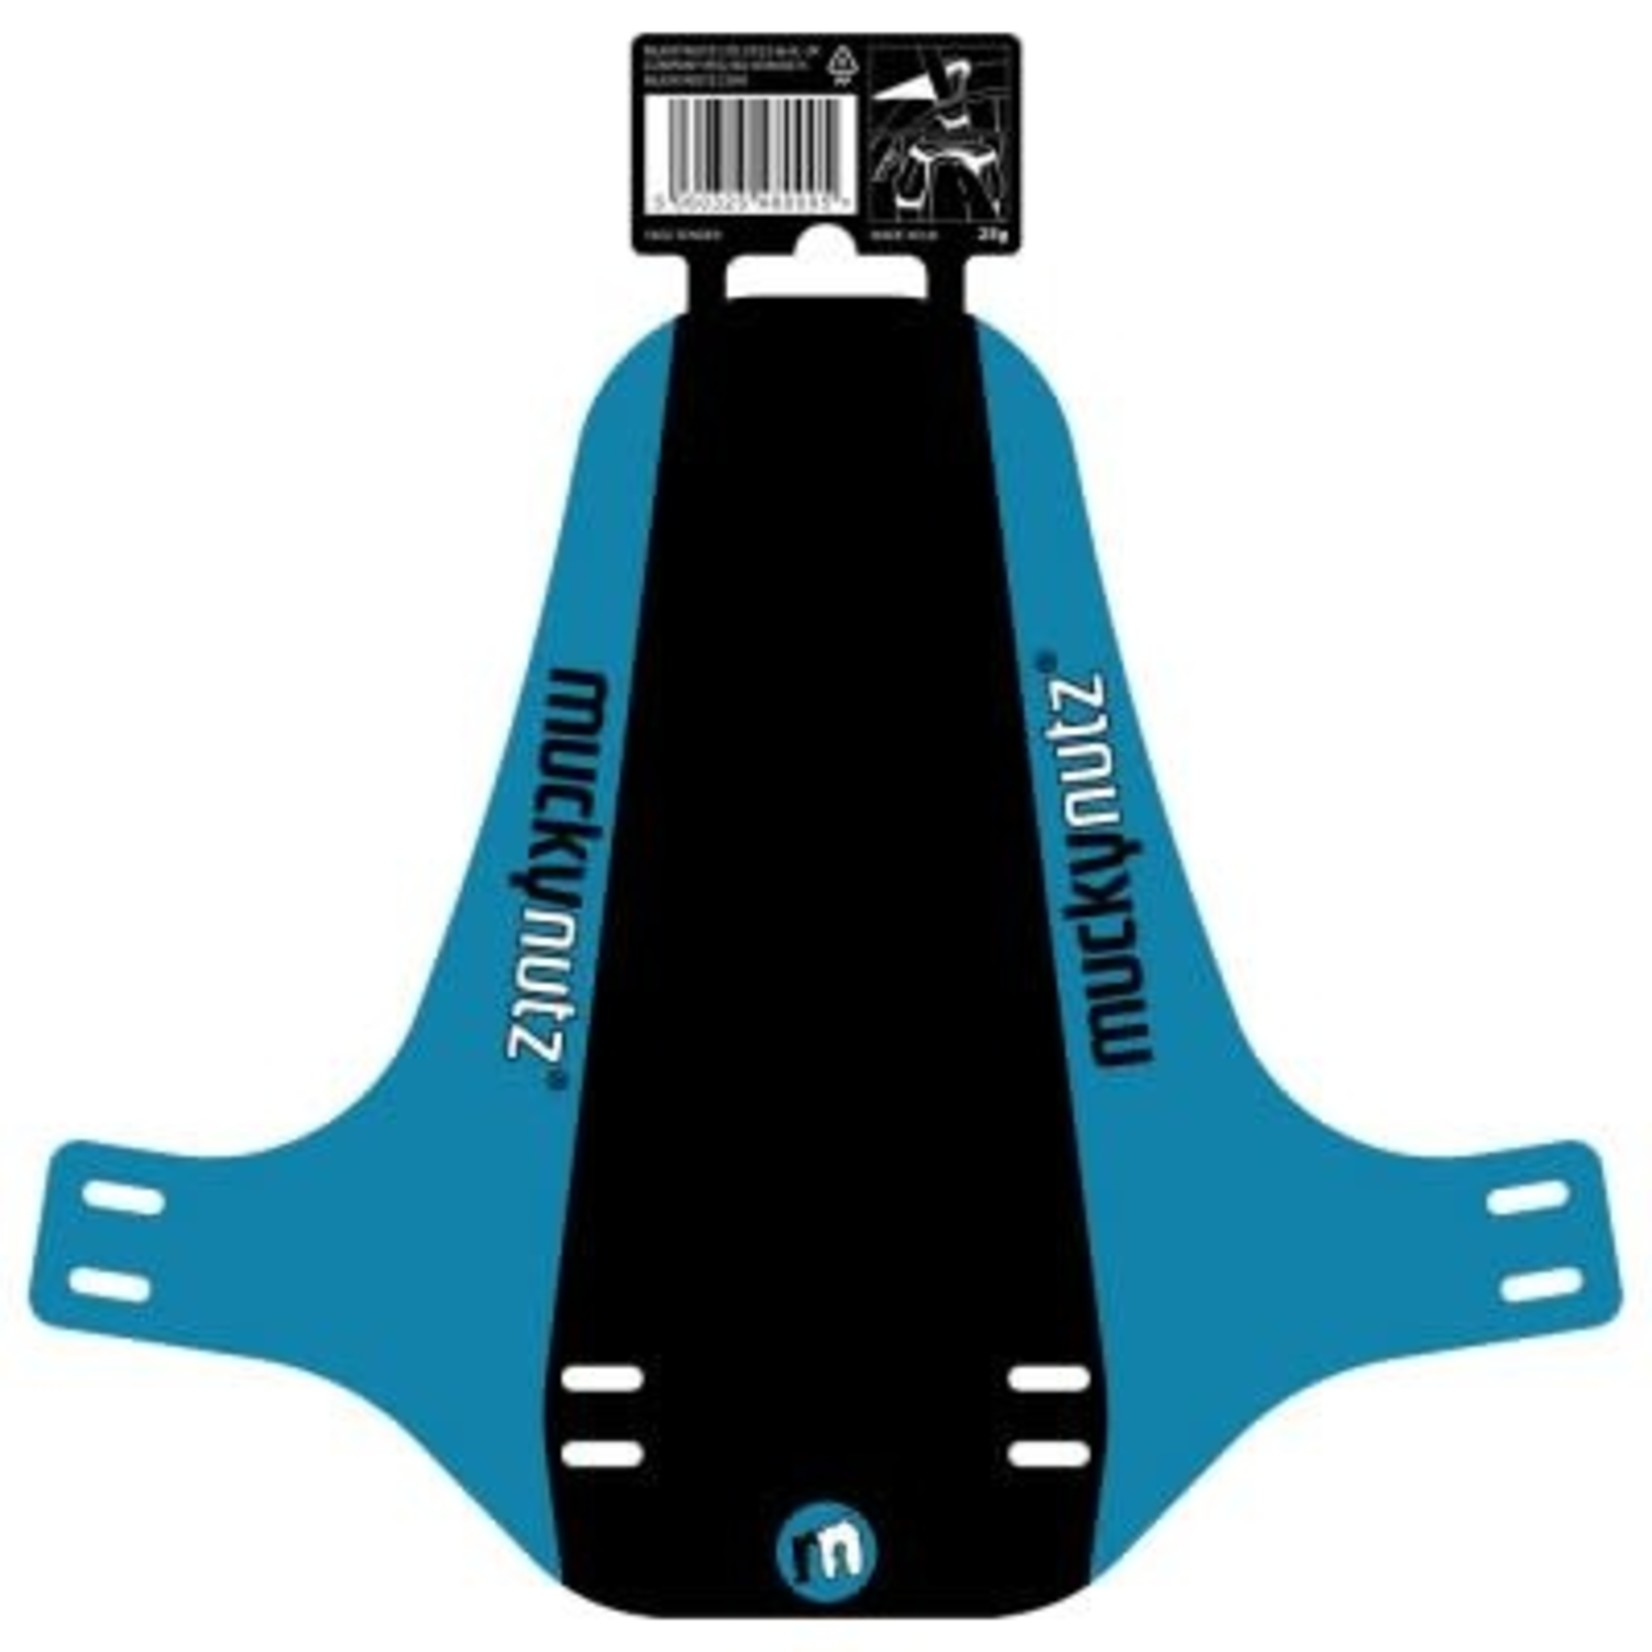 Mucky Nutz Face Fender Black/Blue